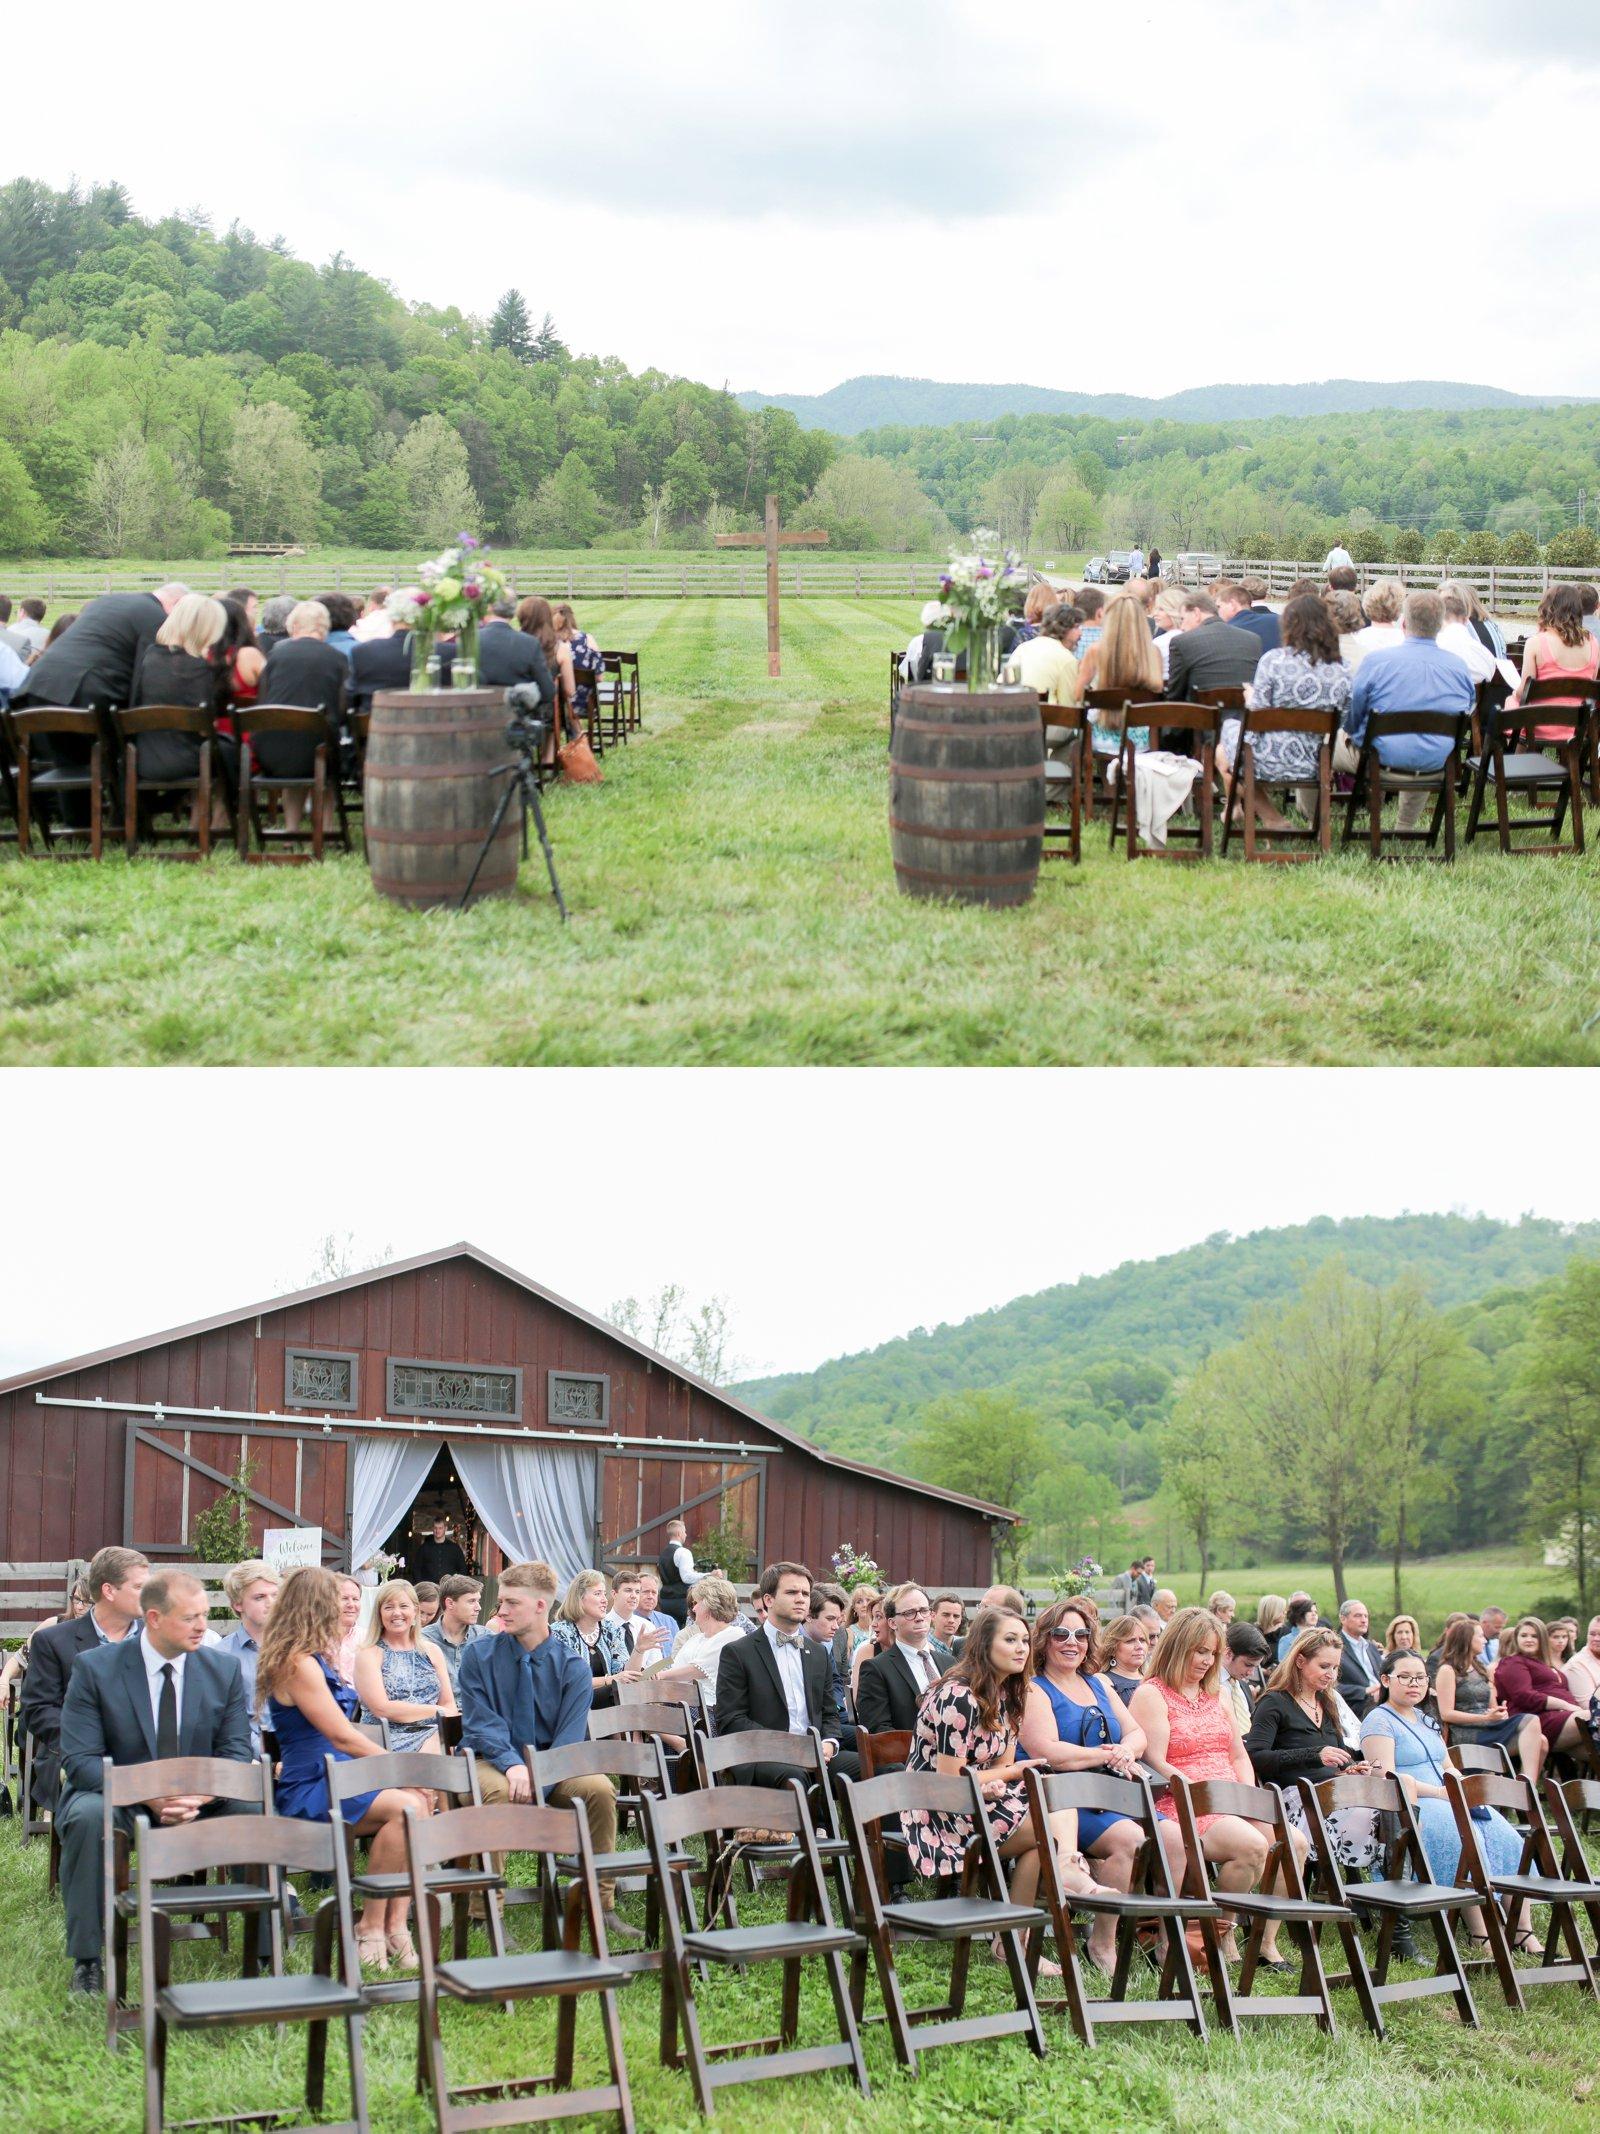 wedding_photographer_Missouri_Destination_elope_intimate_Saint_James_MO_Missouri_KansasCity_Jeff_City_Jefferson_Columbia_Engagement_Photos_Pictures_Session_Best_Videographer_0179.jpg